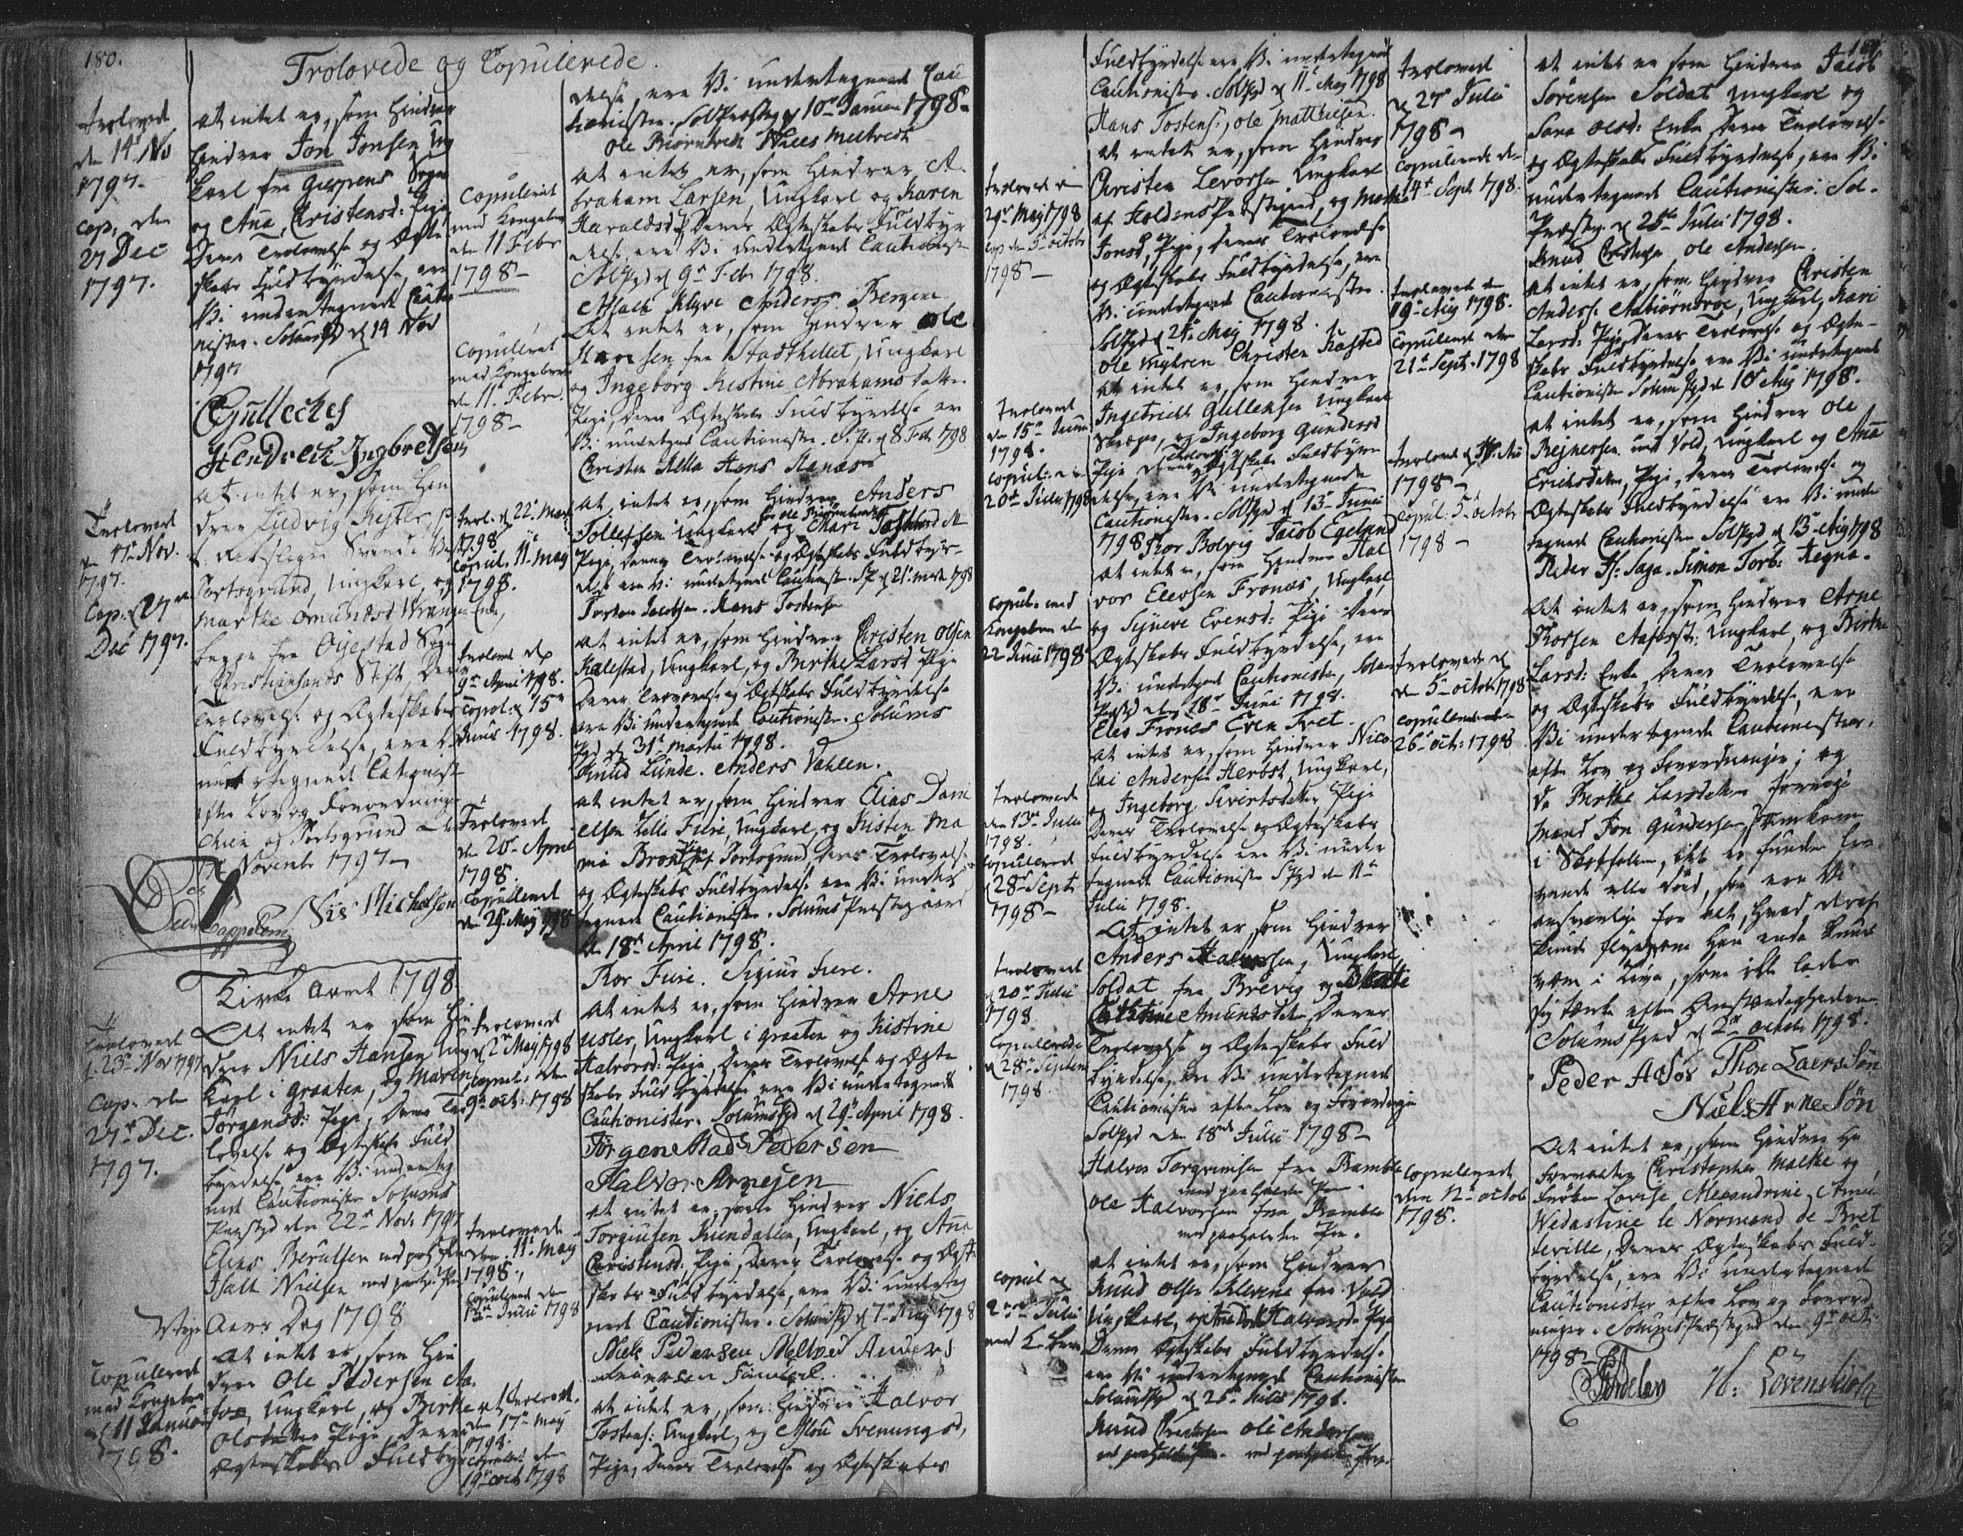 SAKO, Solum kirkebøker, F/Fa/L0003: Ministerialbok nr. I 3, 1761-1814, s. 180-181